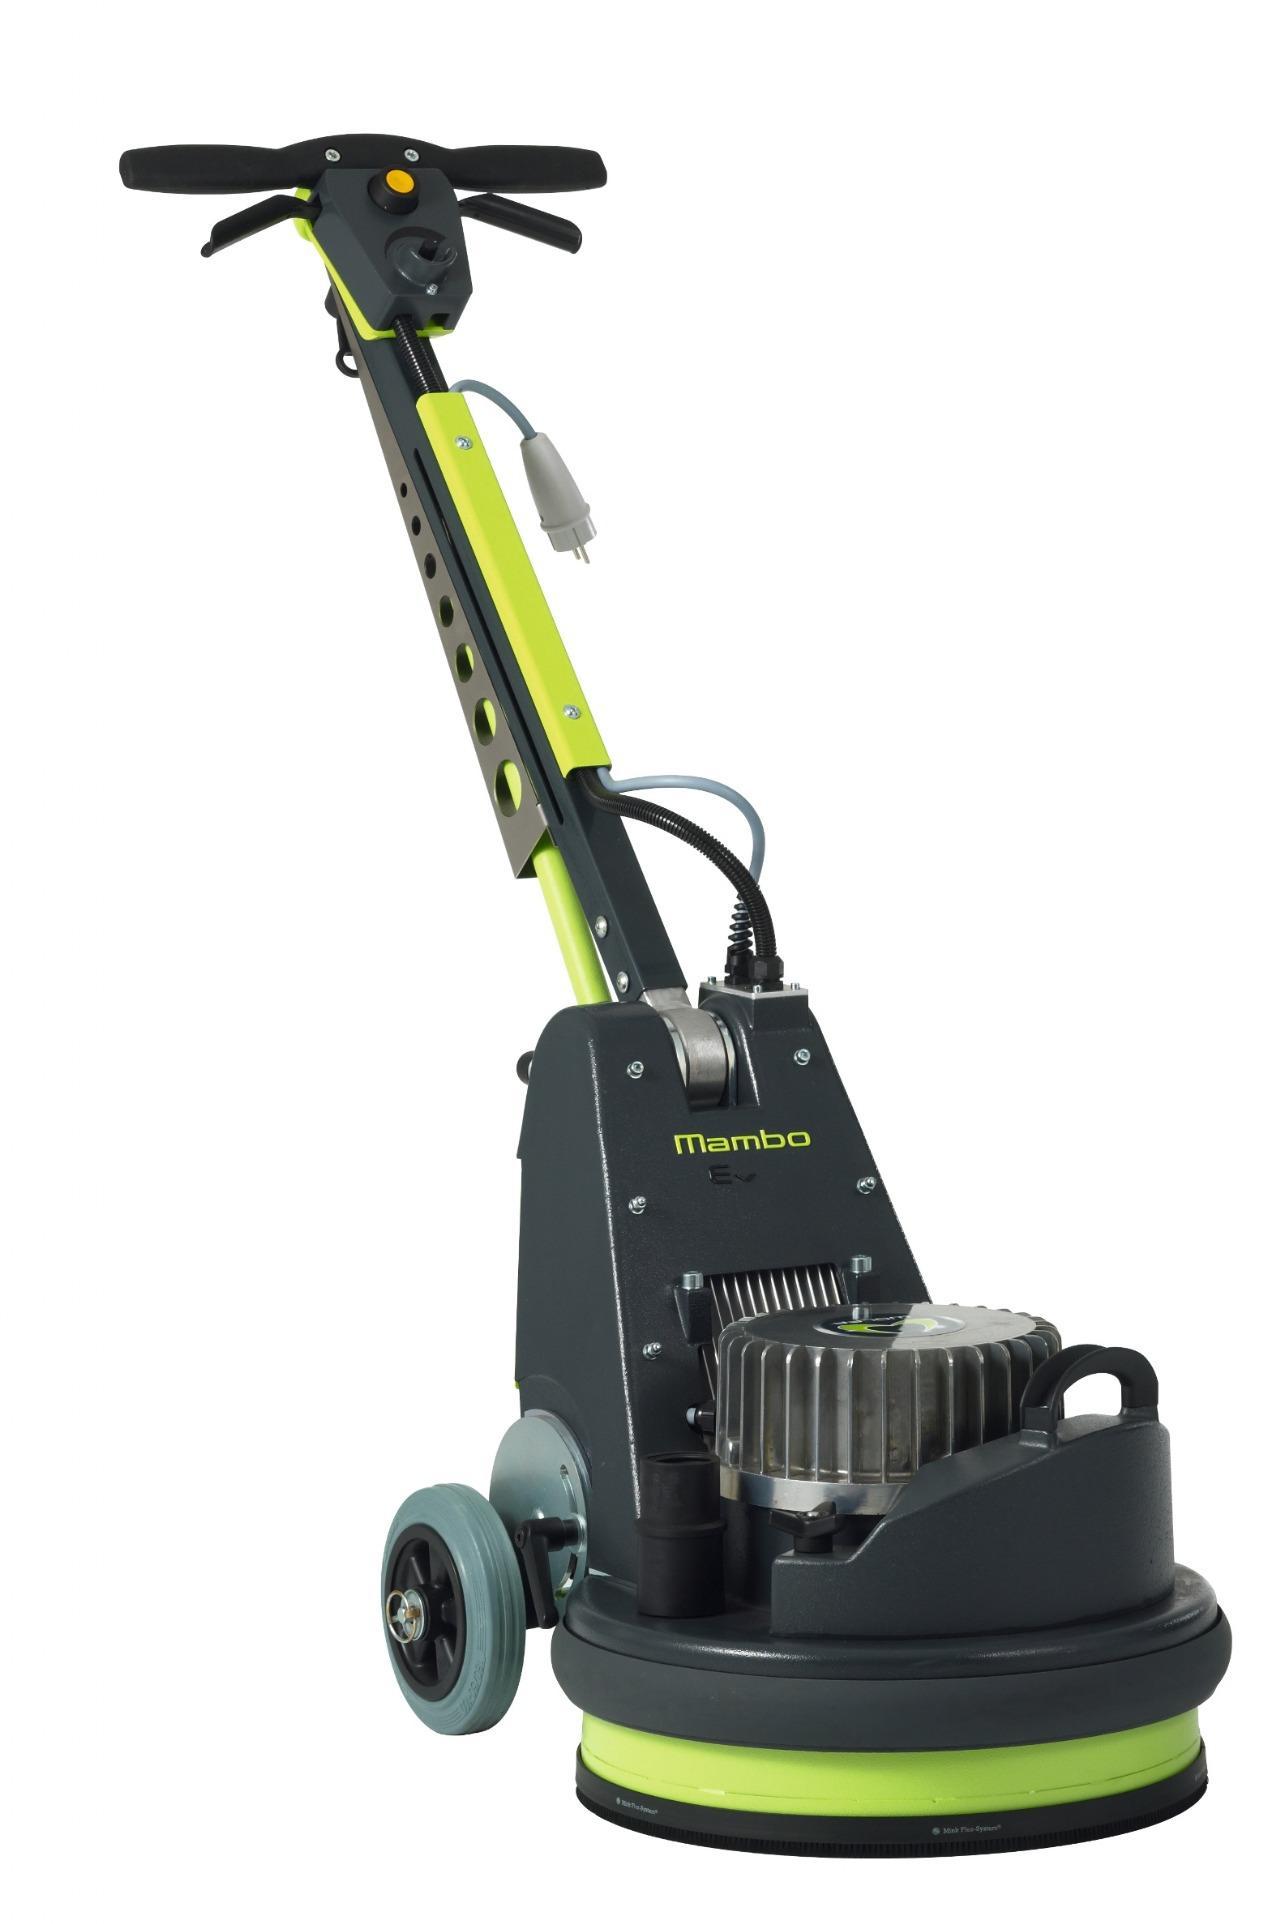 Disc sander wolff pro 80kg for sanding of various floor coverings (option: vacuum cleaner) (1)